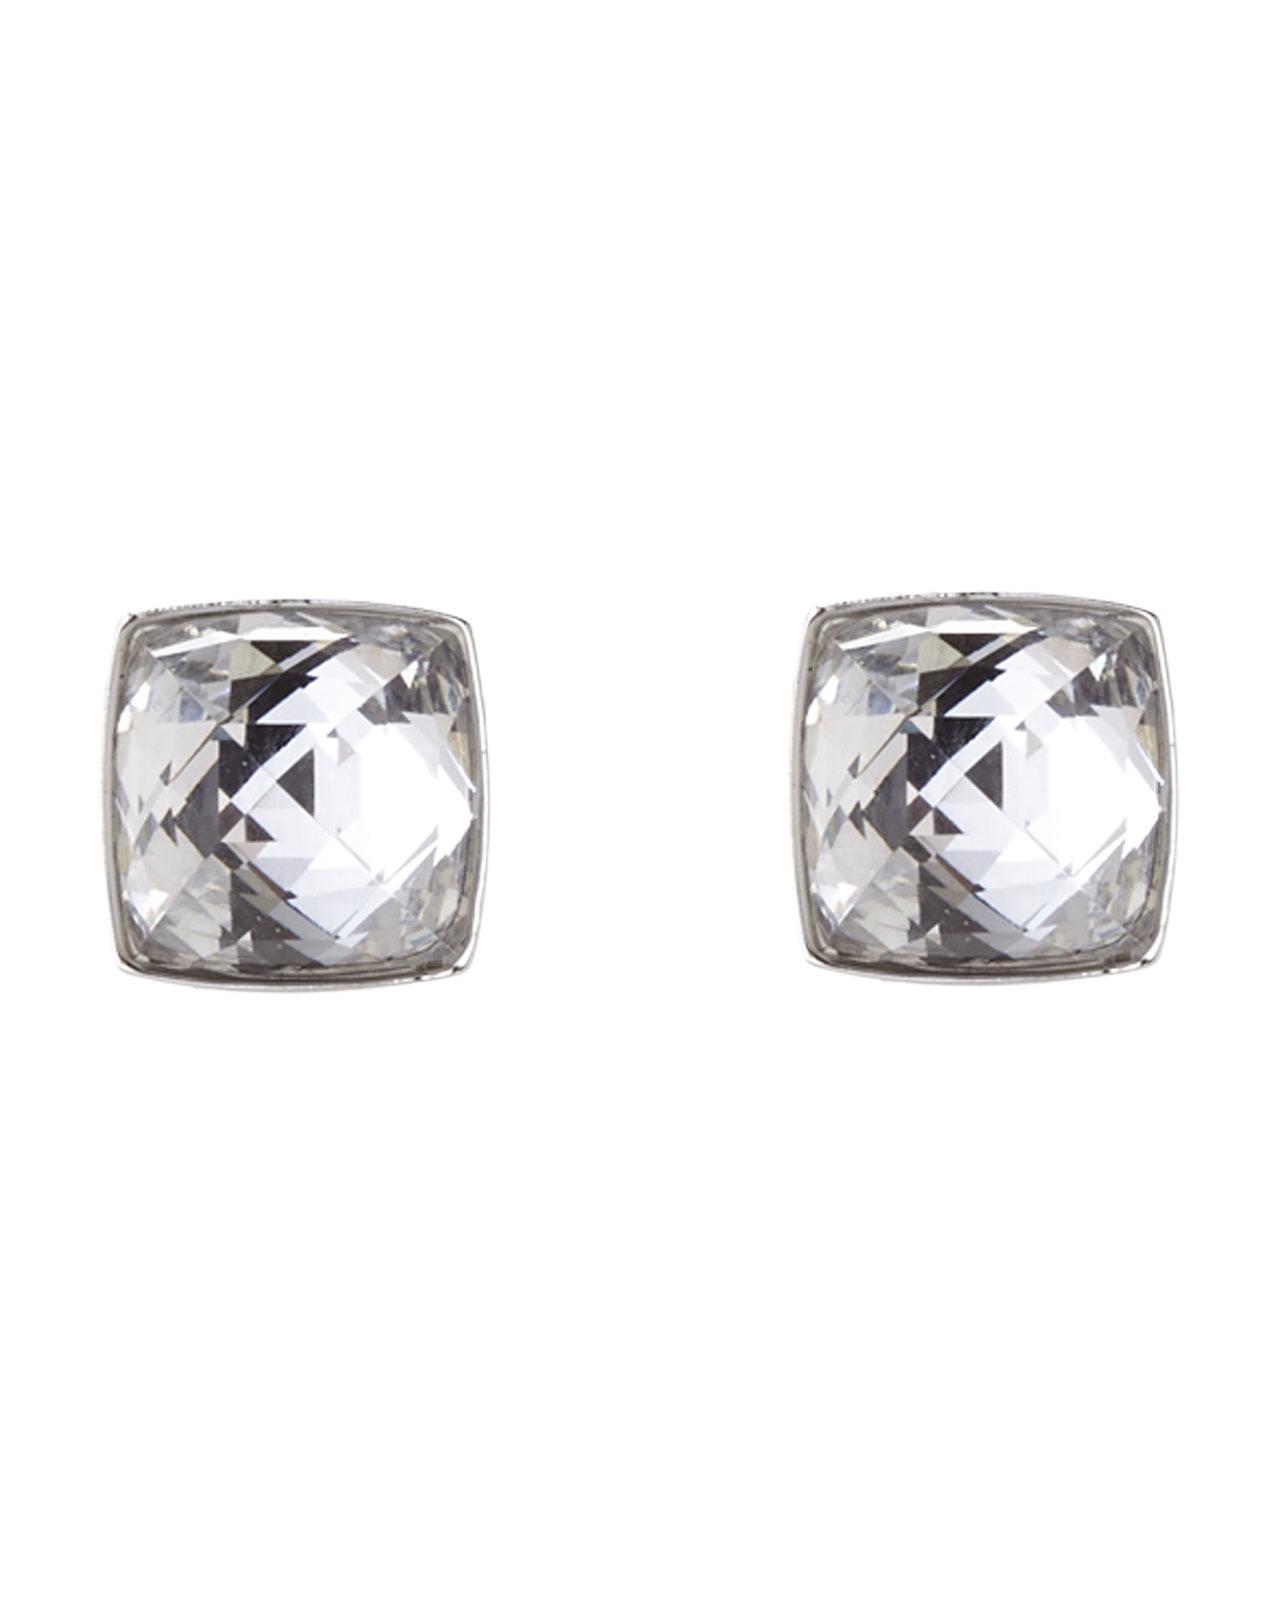 Lyst - Swarovski Silver-Tone Square Crystal Earrings in Metallic 03ac45b8679b